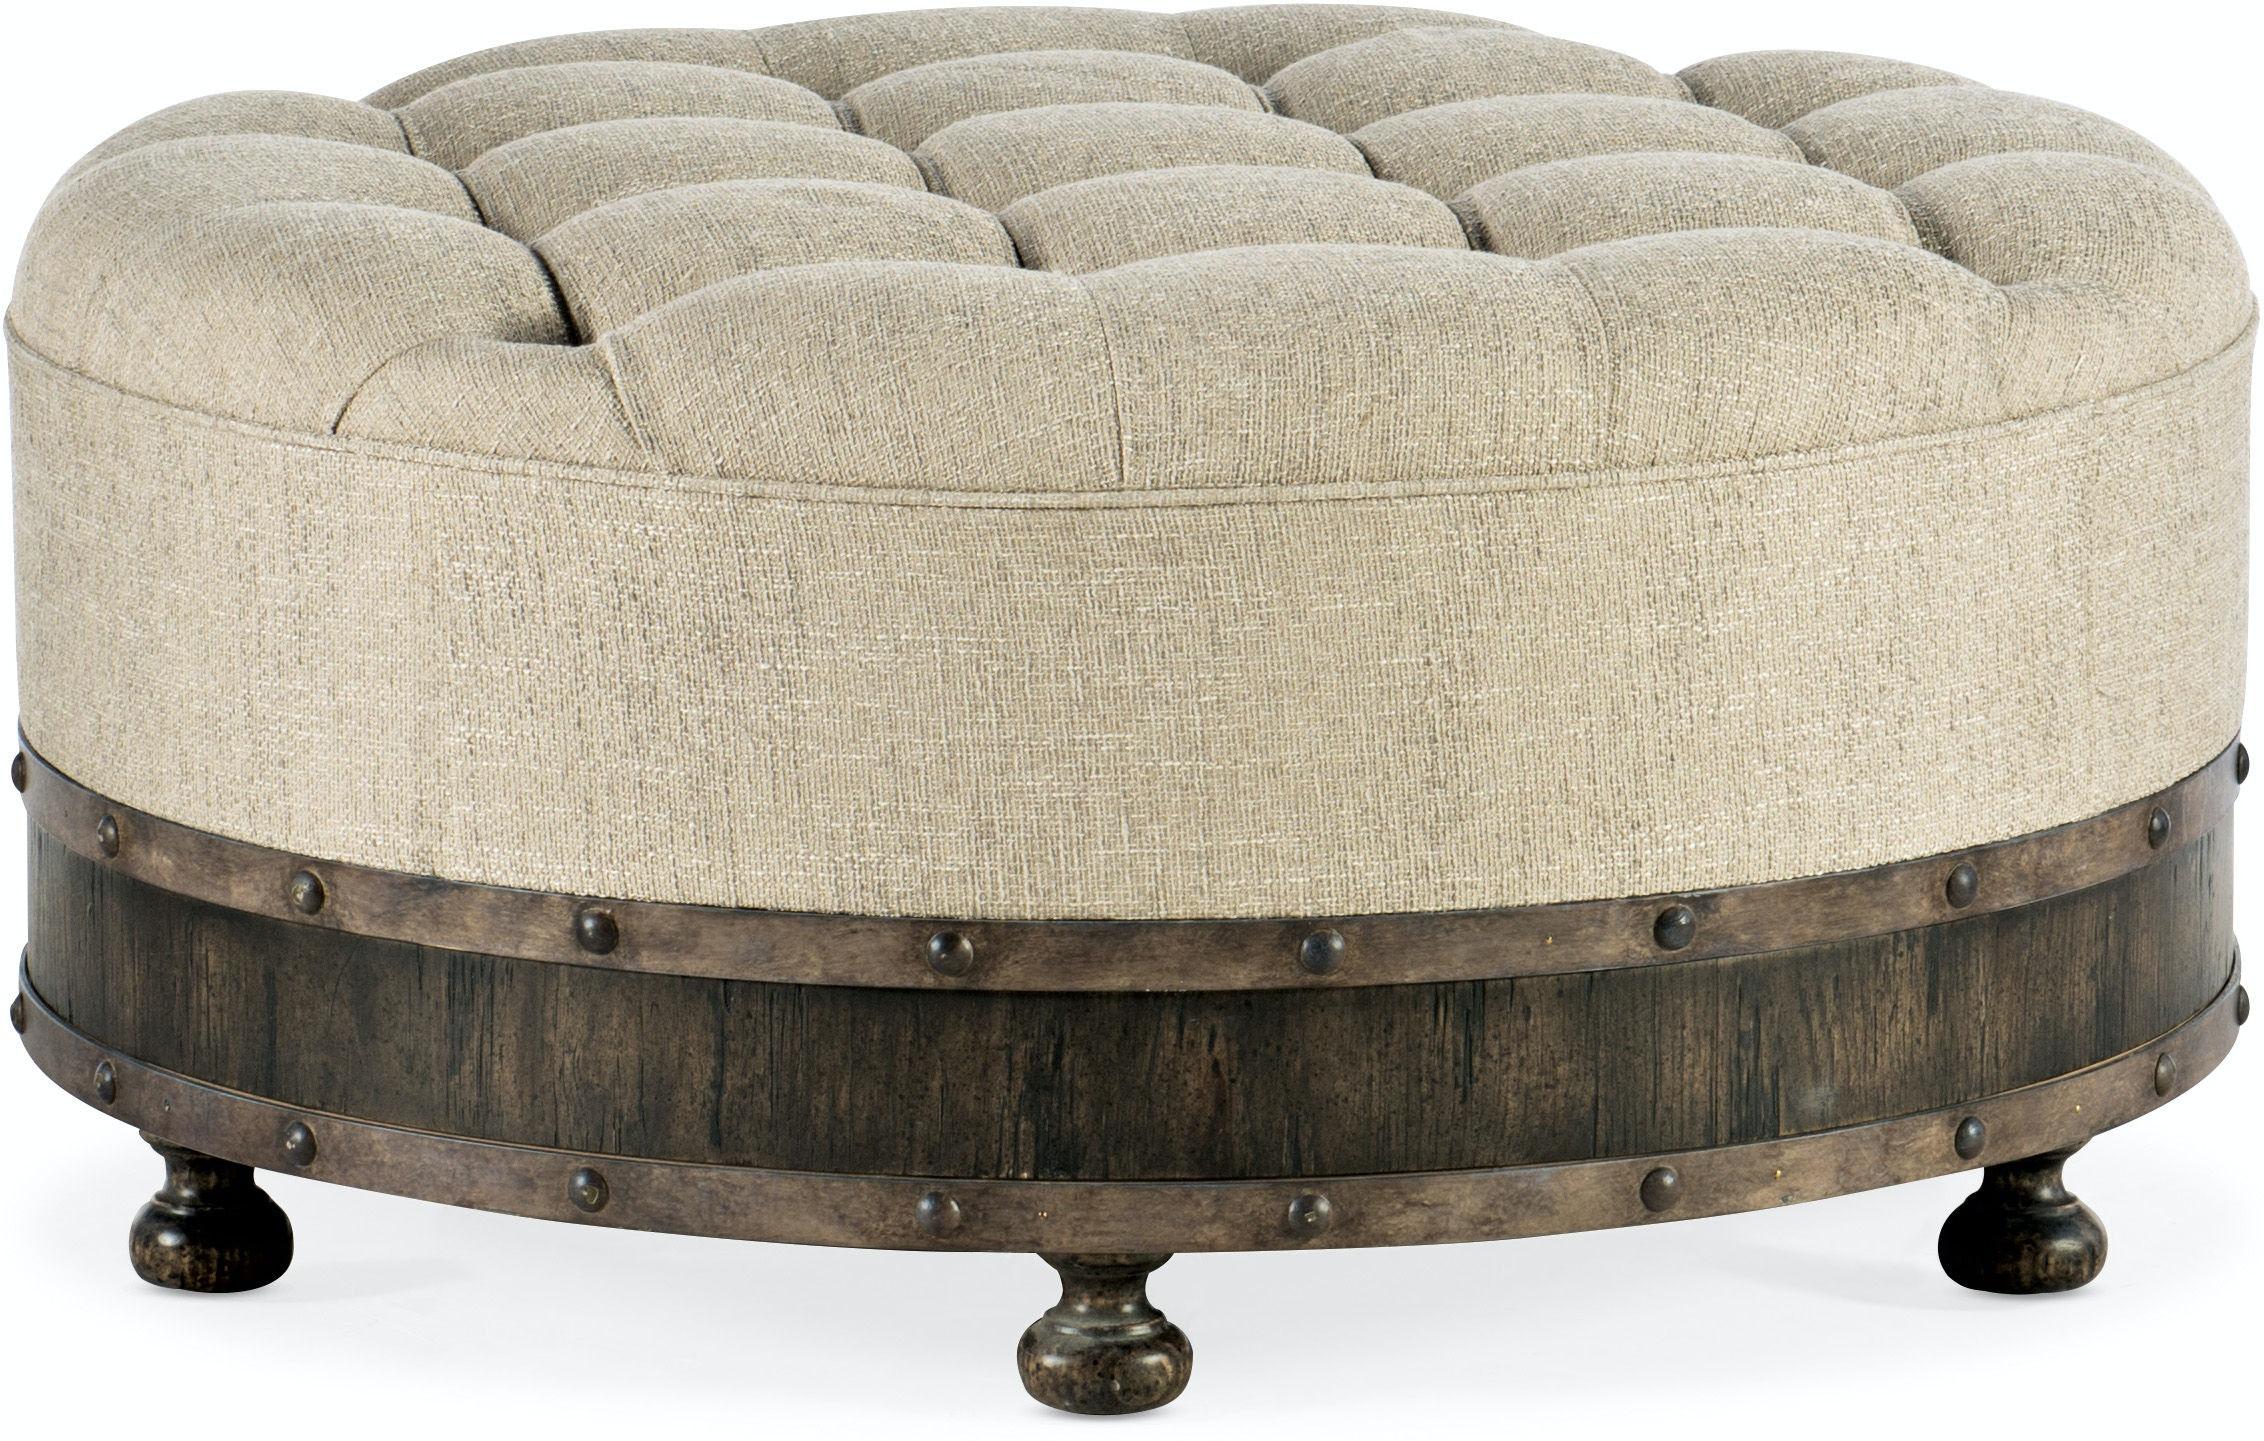 Enjoyable Hooker Furniture Living Room La Grange Giddings Round Uph Alphanode Cool Chair Designs And Ideas Alphanodeonline